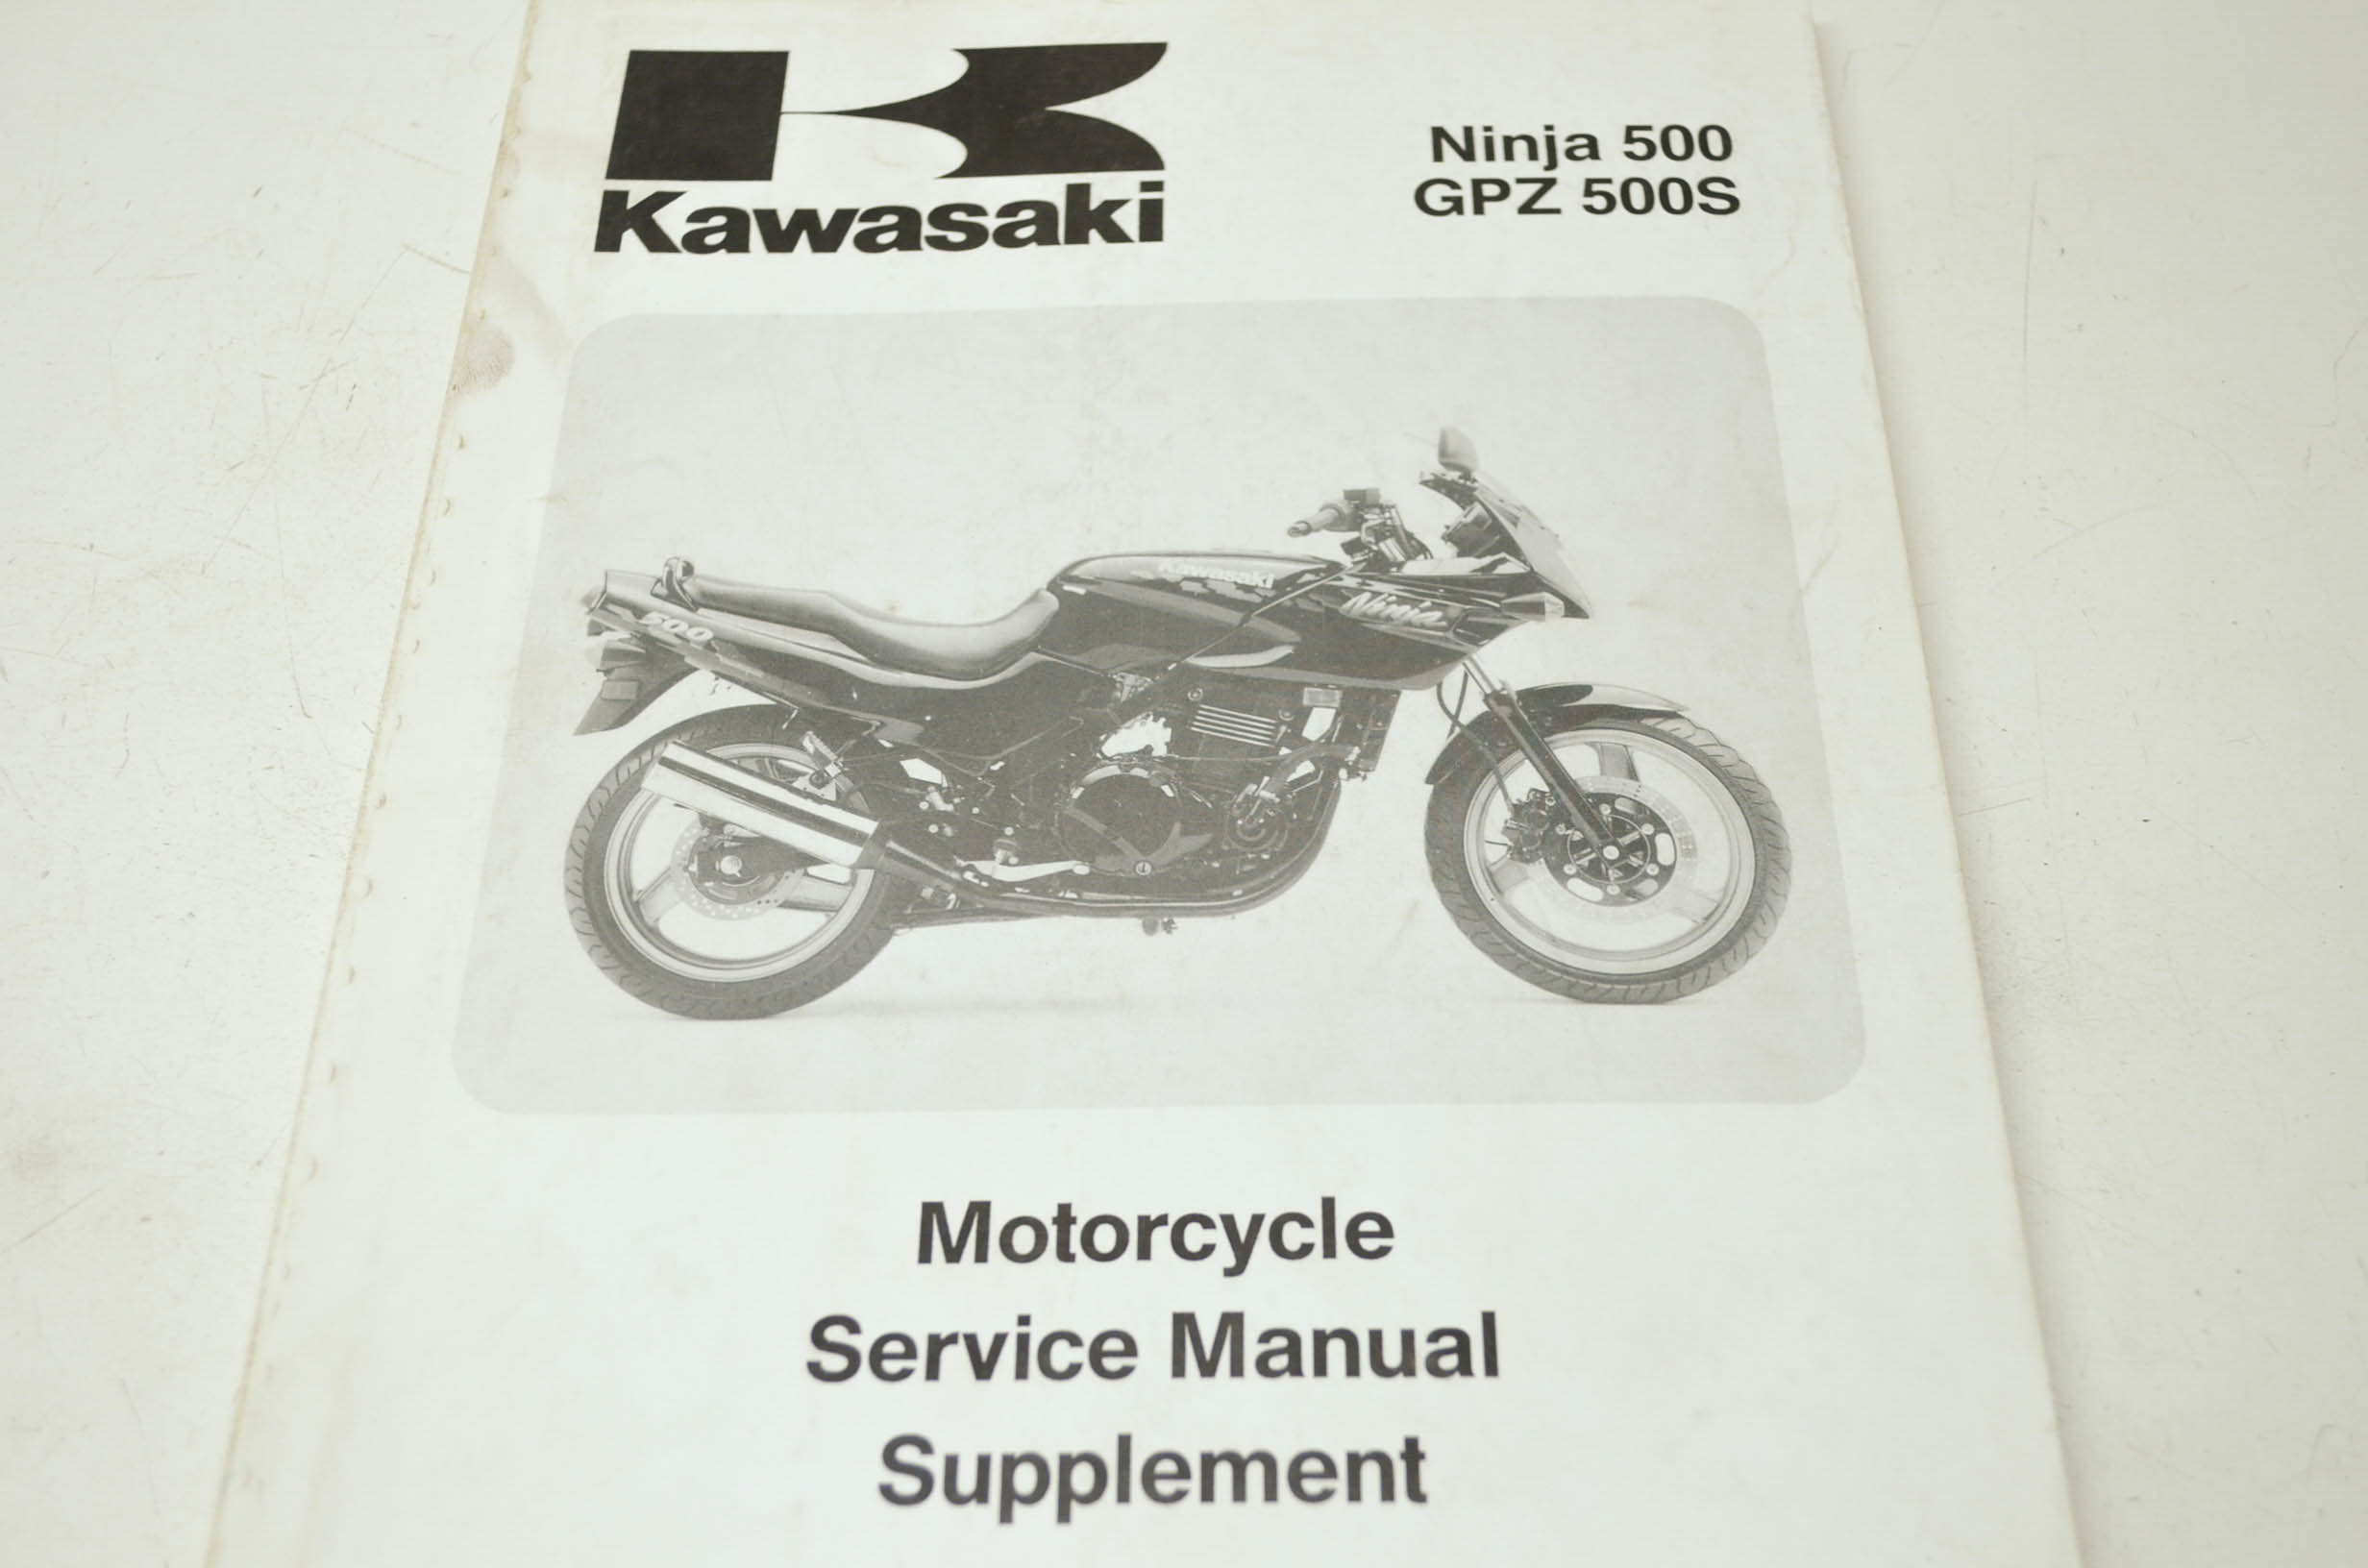 Kawasaki gpz 500 service manual pdf